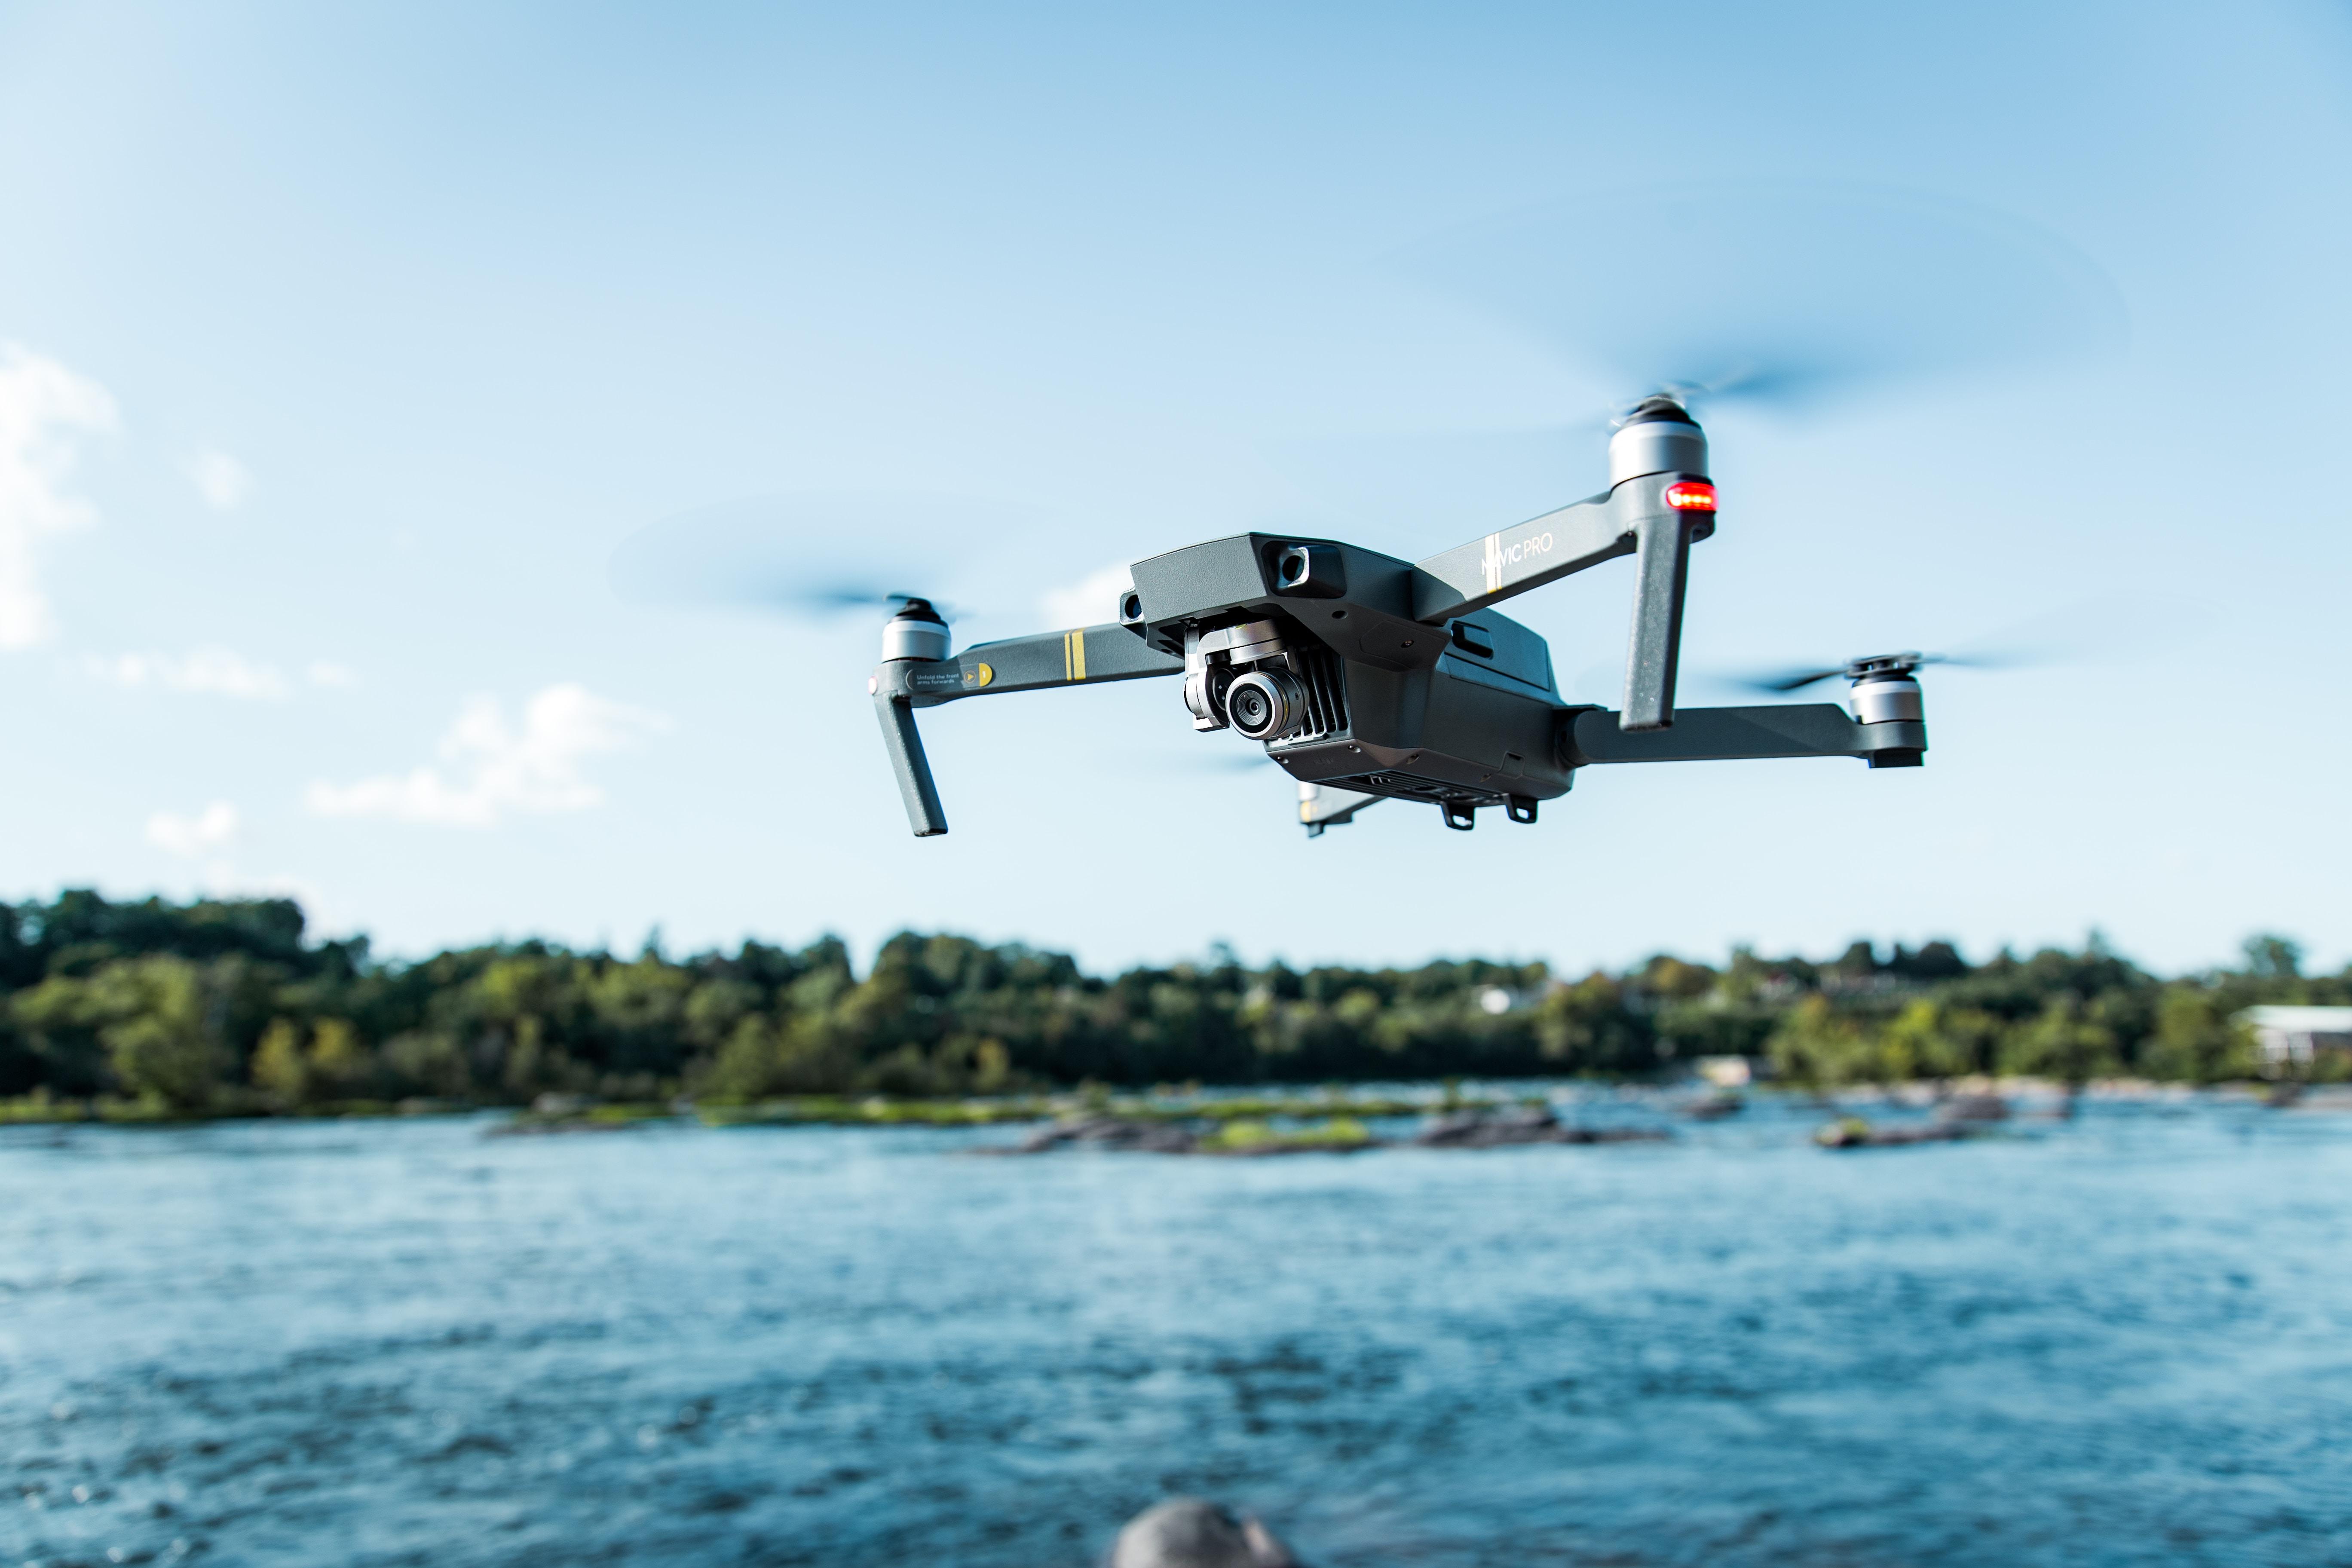 black DJI Mavi quadcopter near body of water